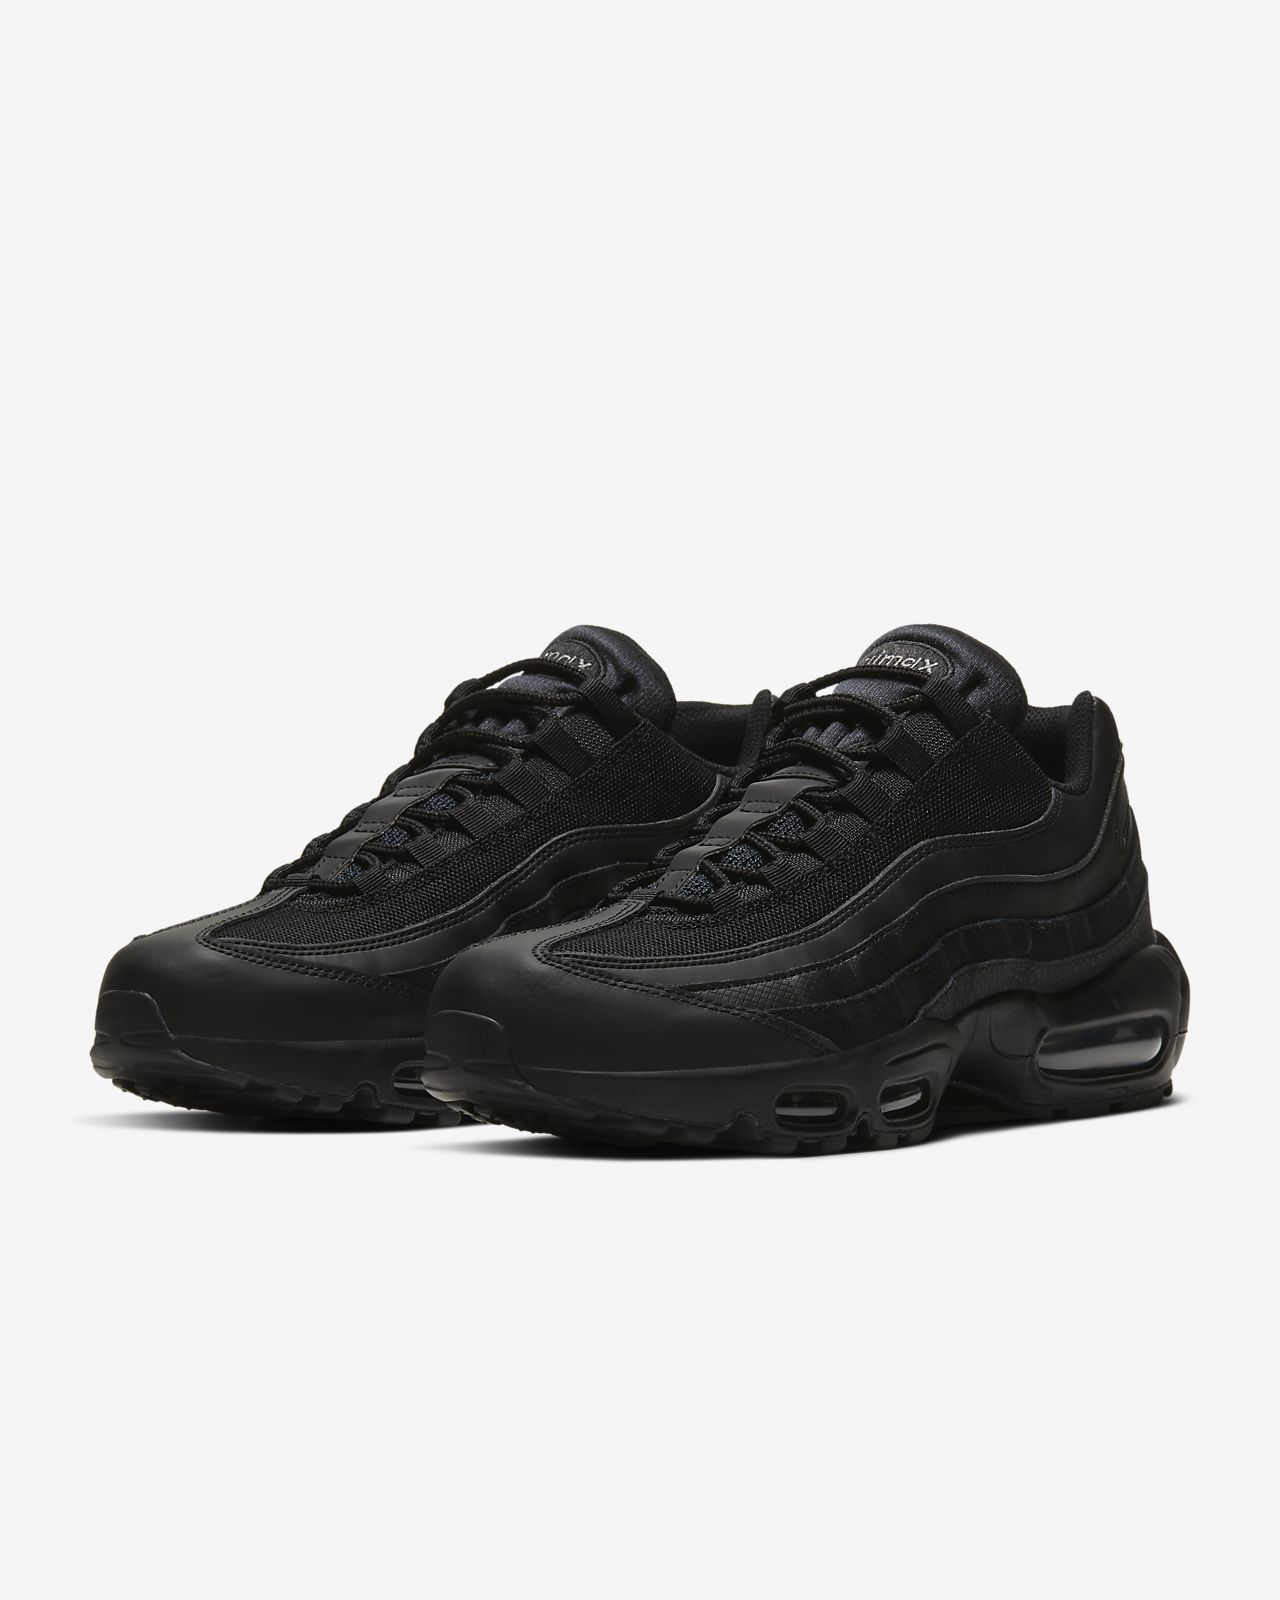 Nike Air Max 95 Ultra Essential Men's Nike Sneakers Product